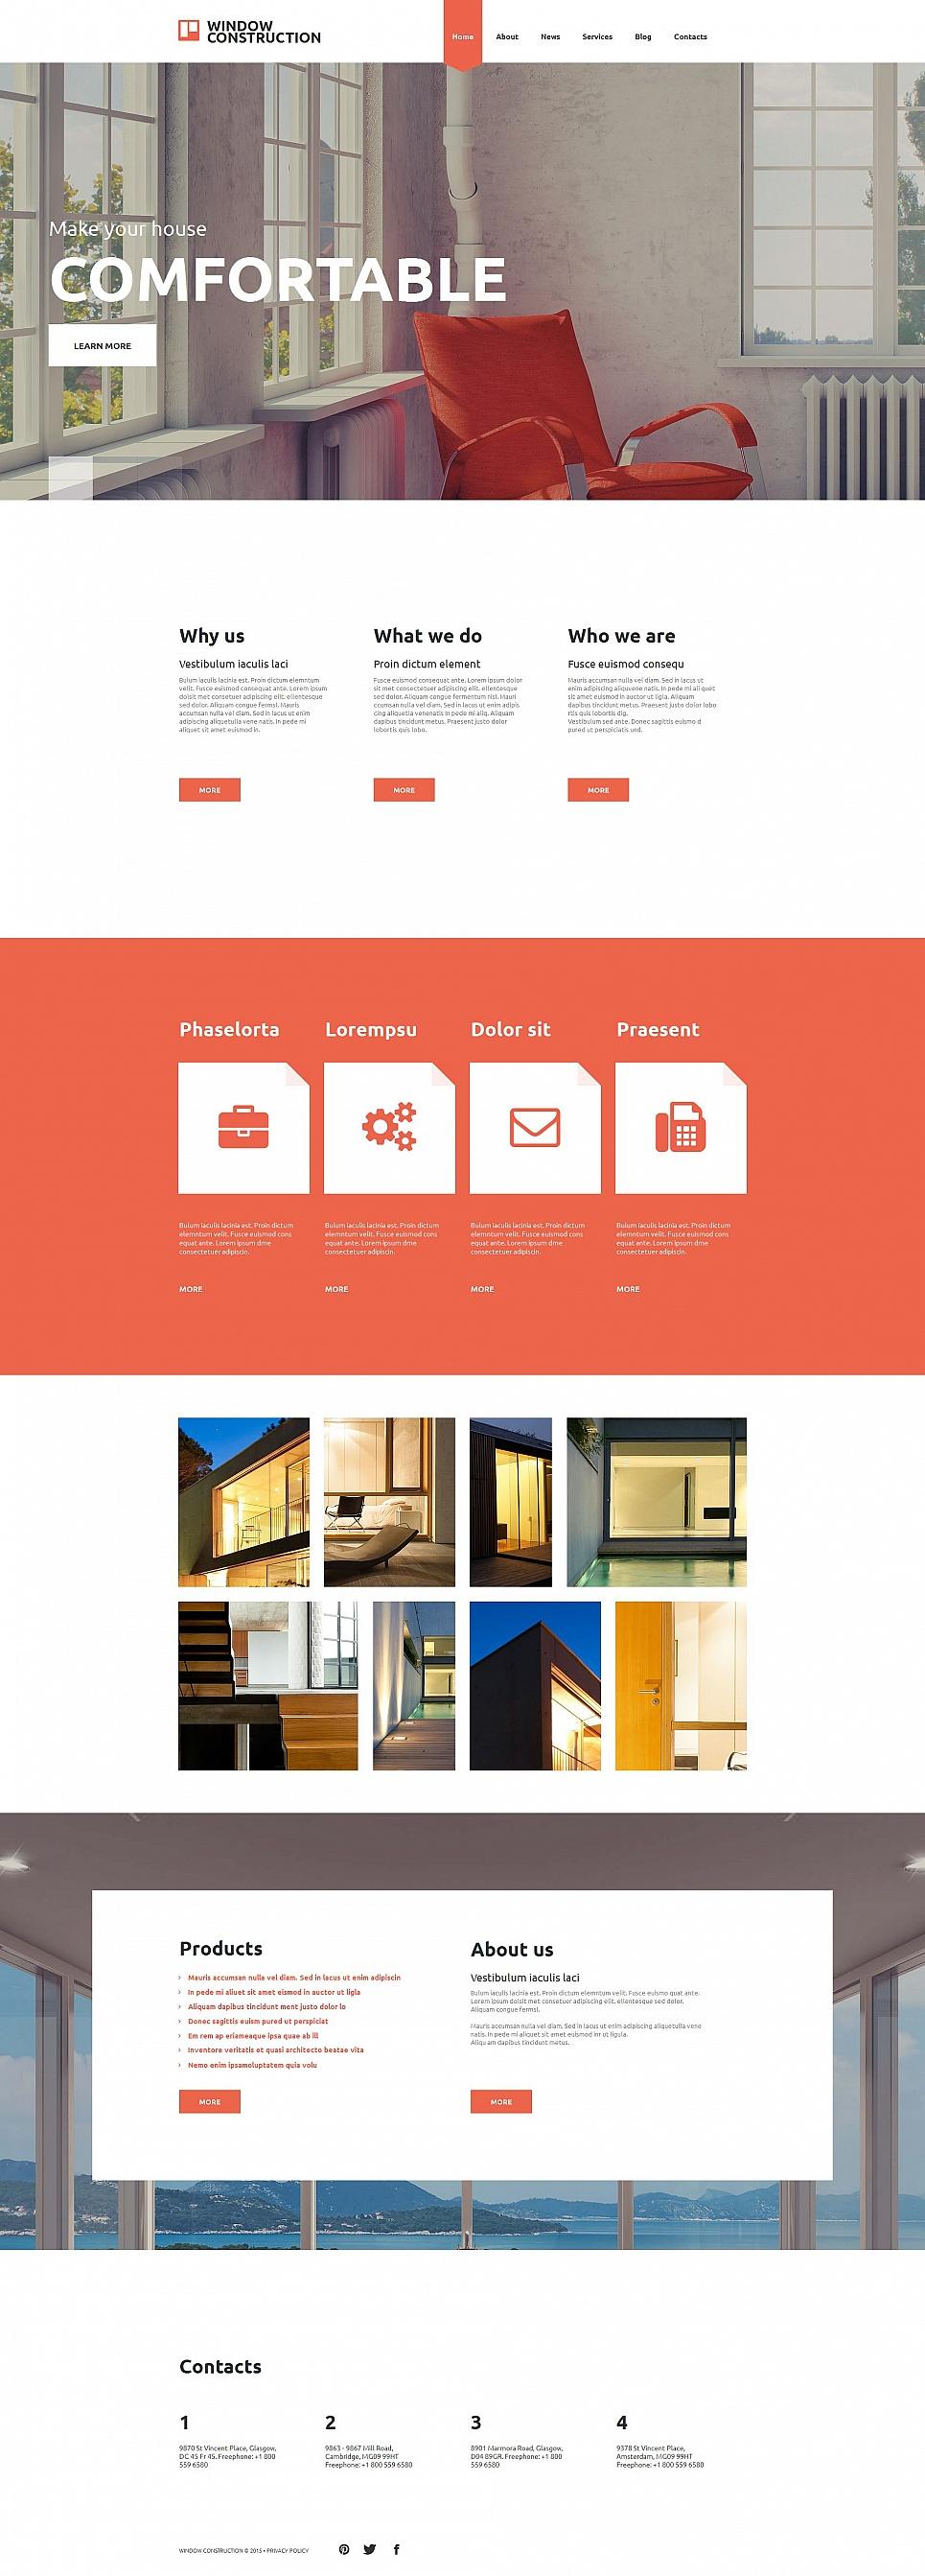 MotoCMS HTML Шаблон #54760 из категории Интерьер и мебель - image